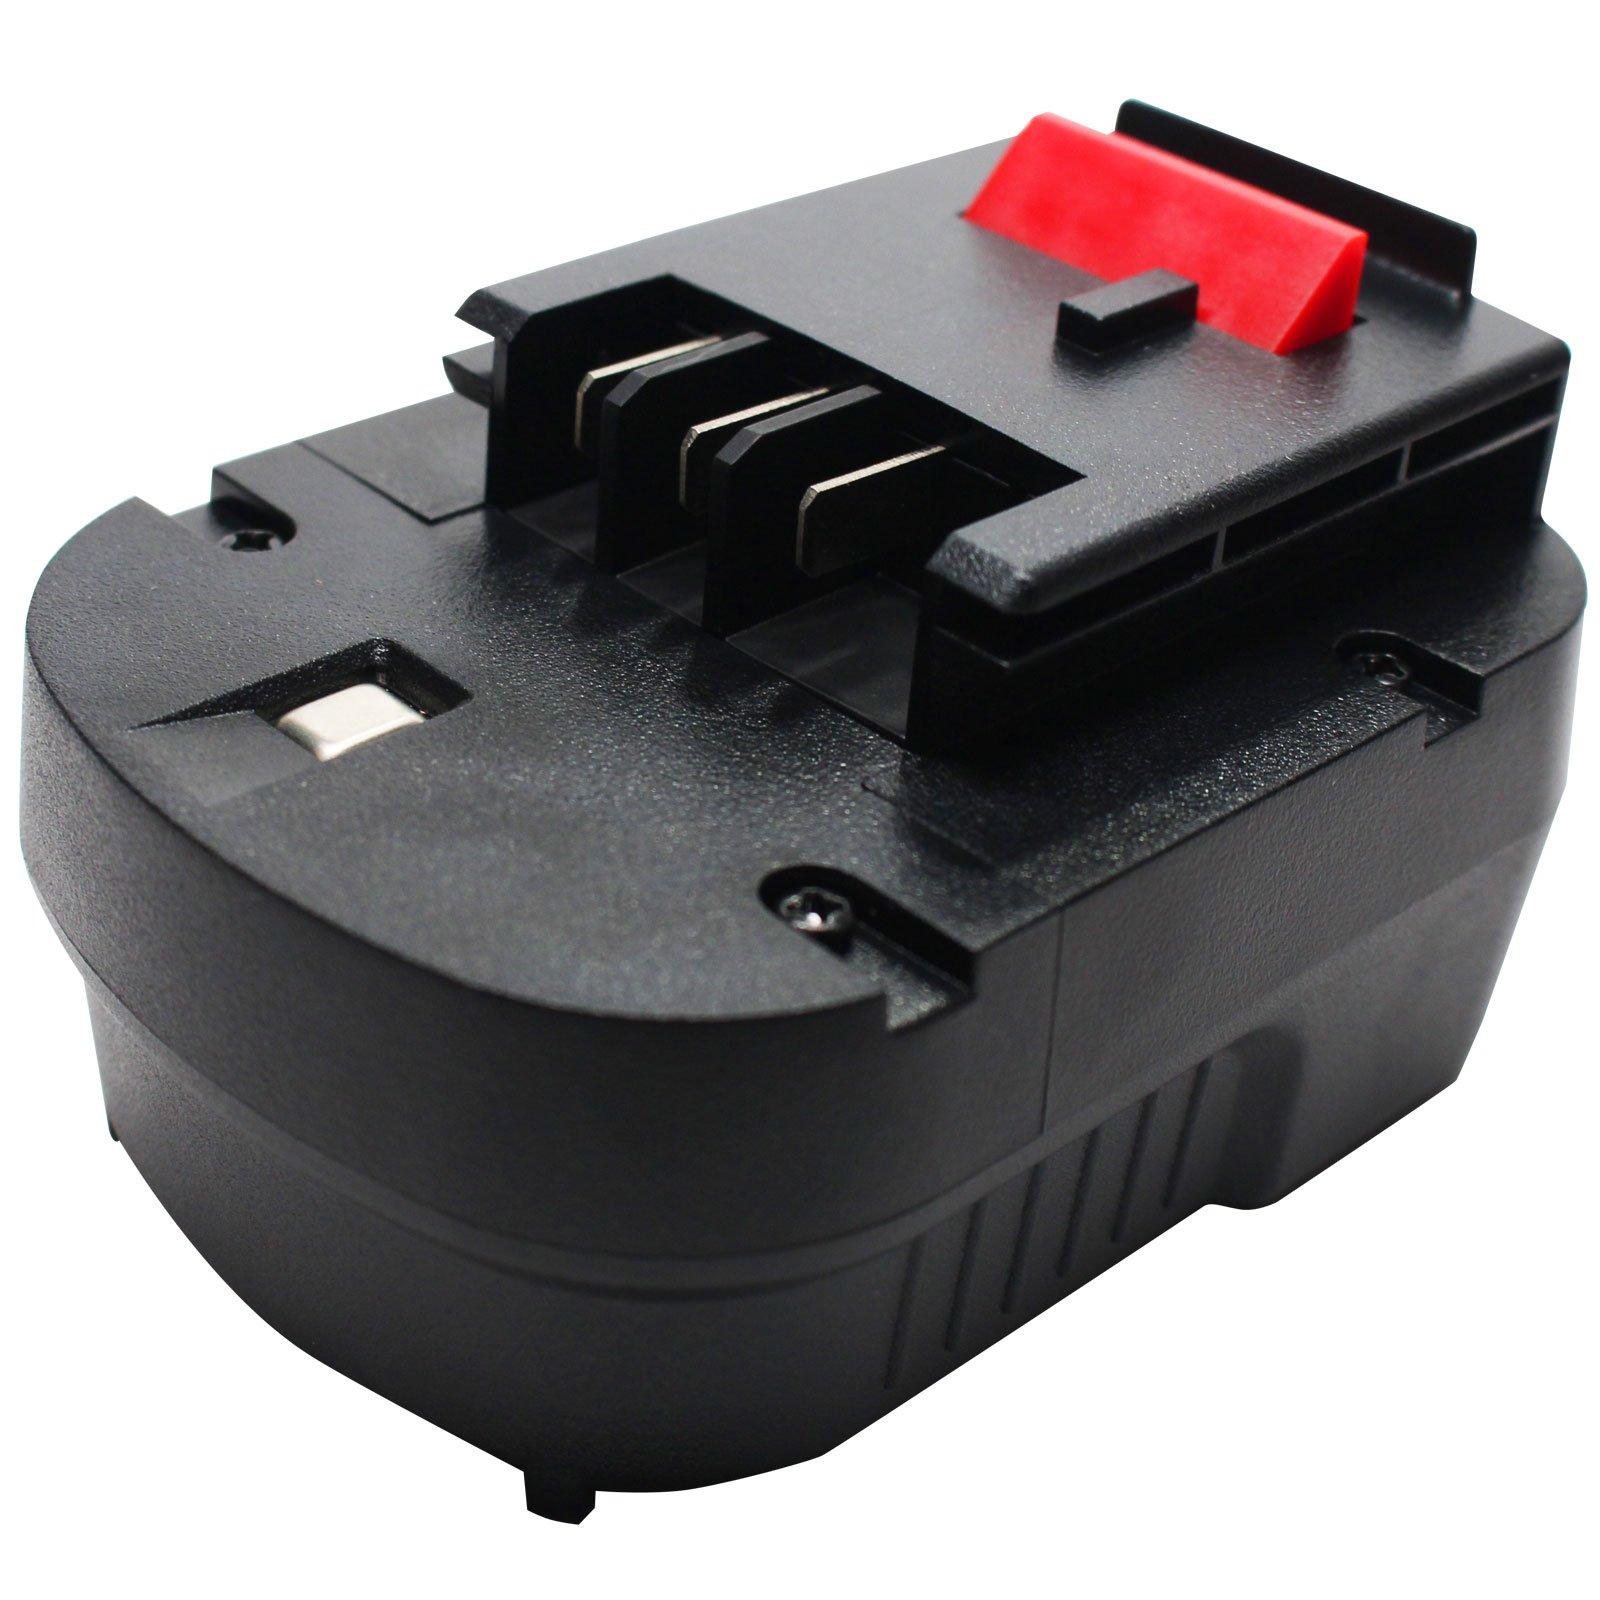 Firestorm FSD122 Battery Replacement - For Firestorm 12V FS120B Power Tool Battery (1300mAh, NICD)